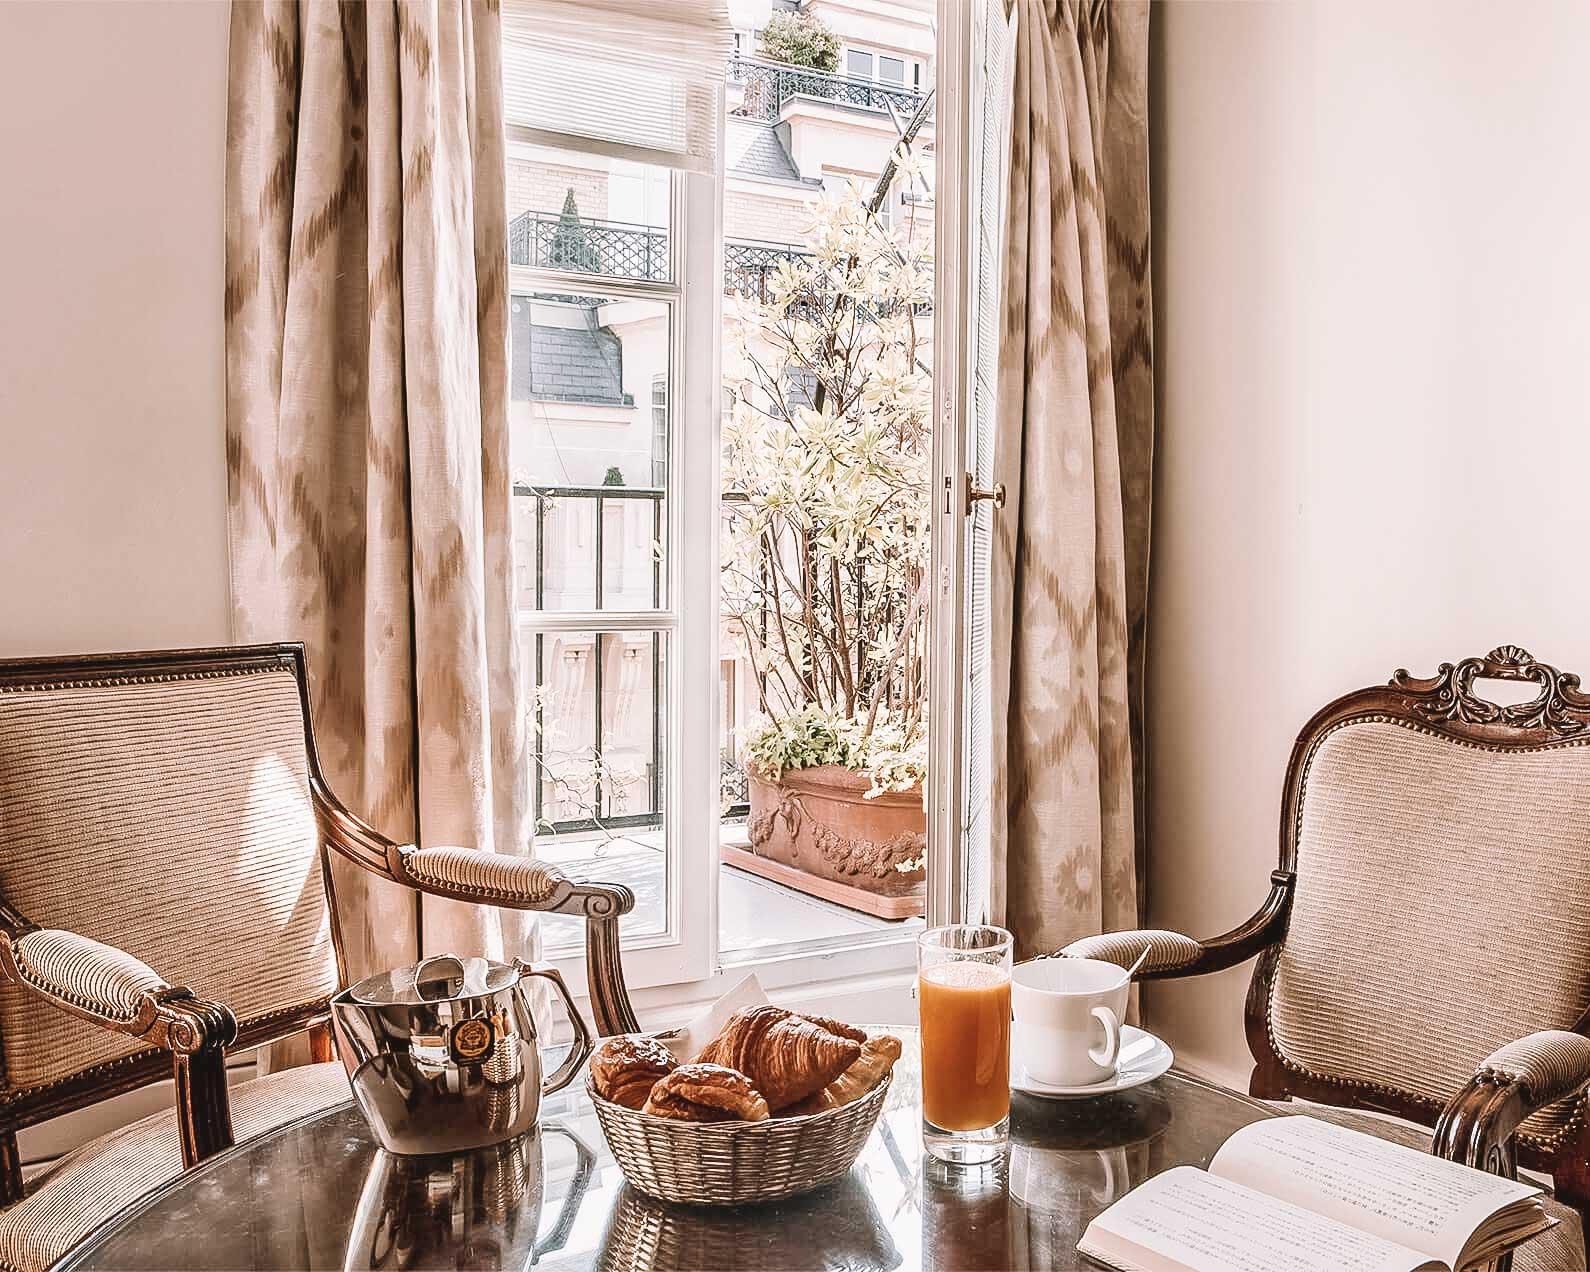 hotel mansart in paris the breakfast